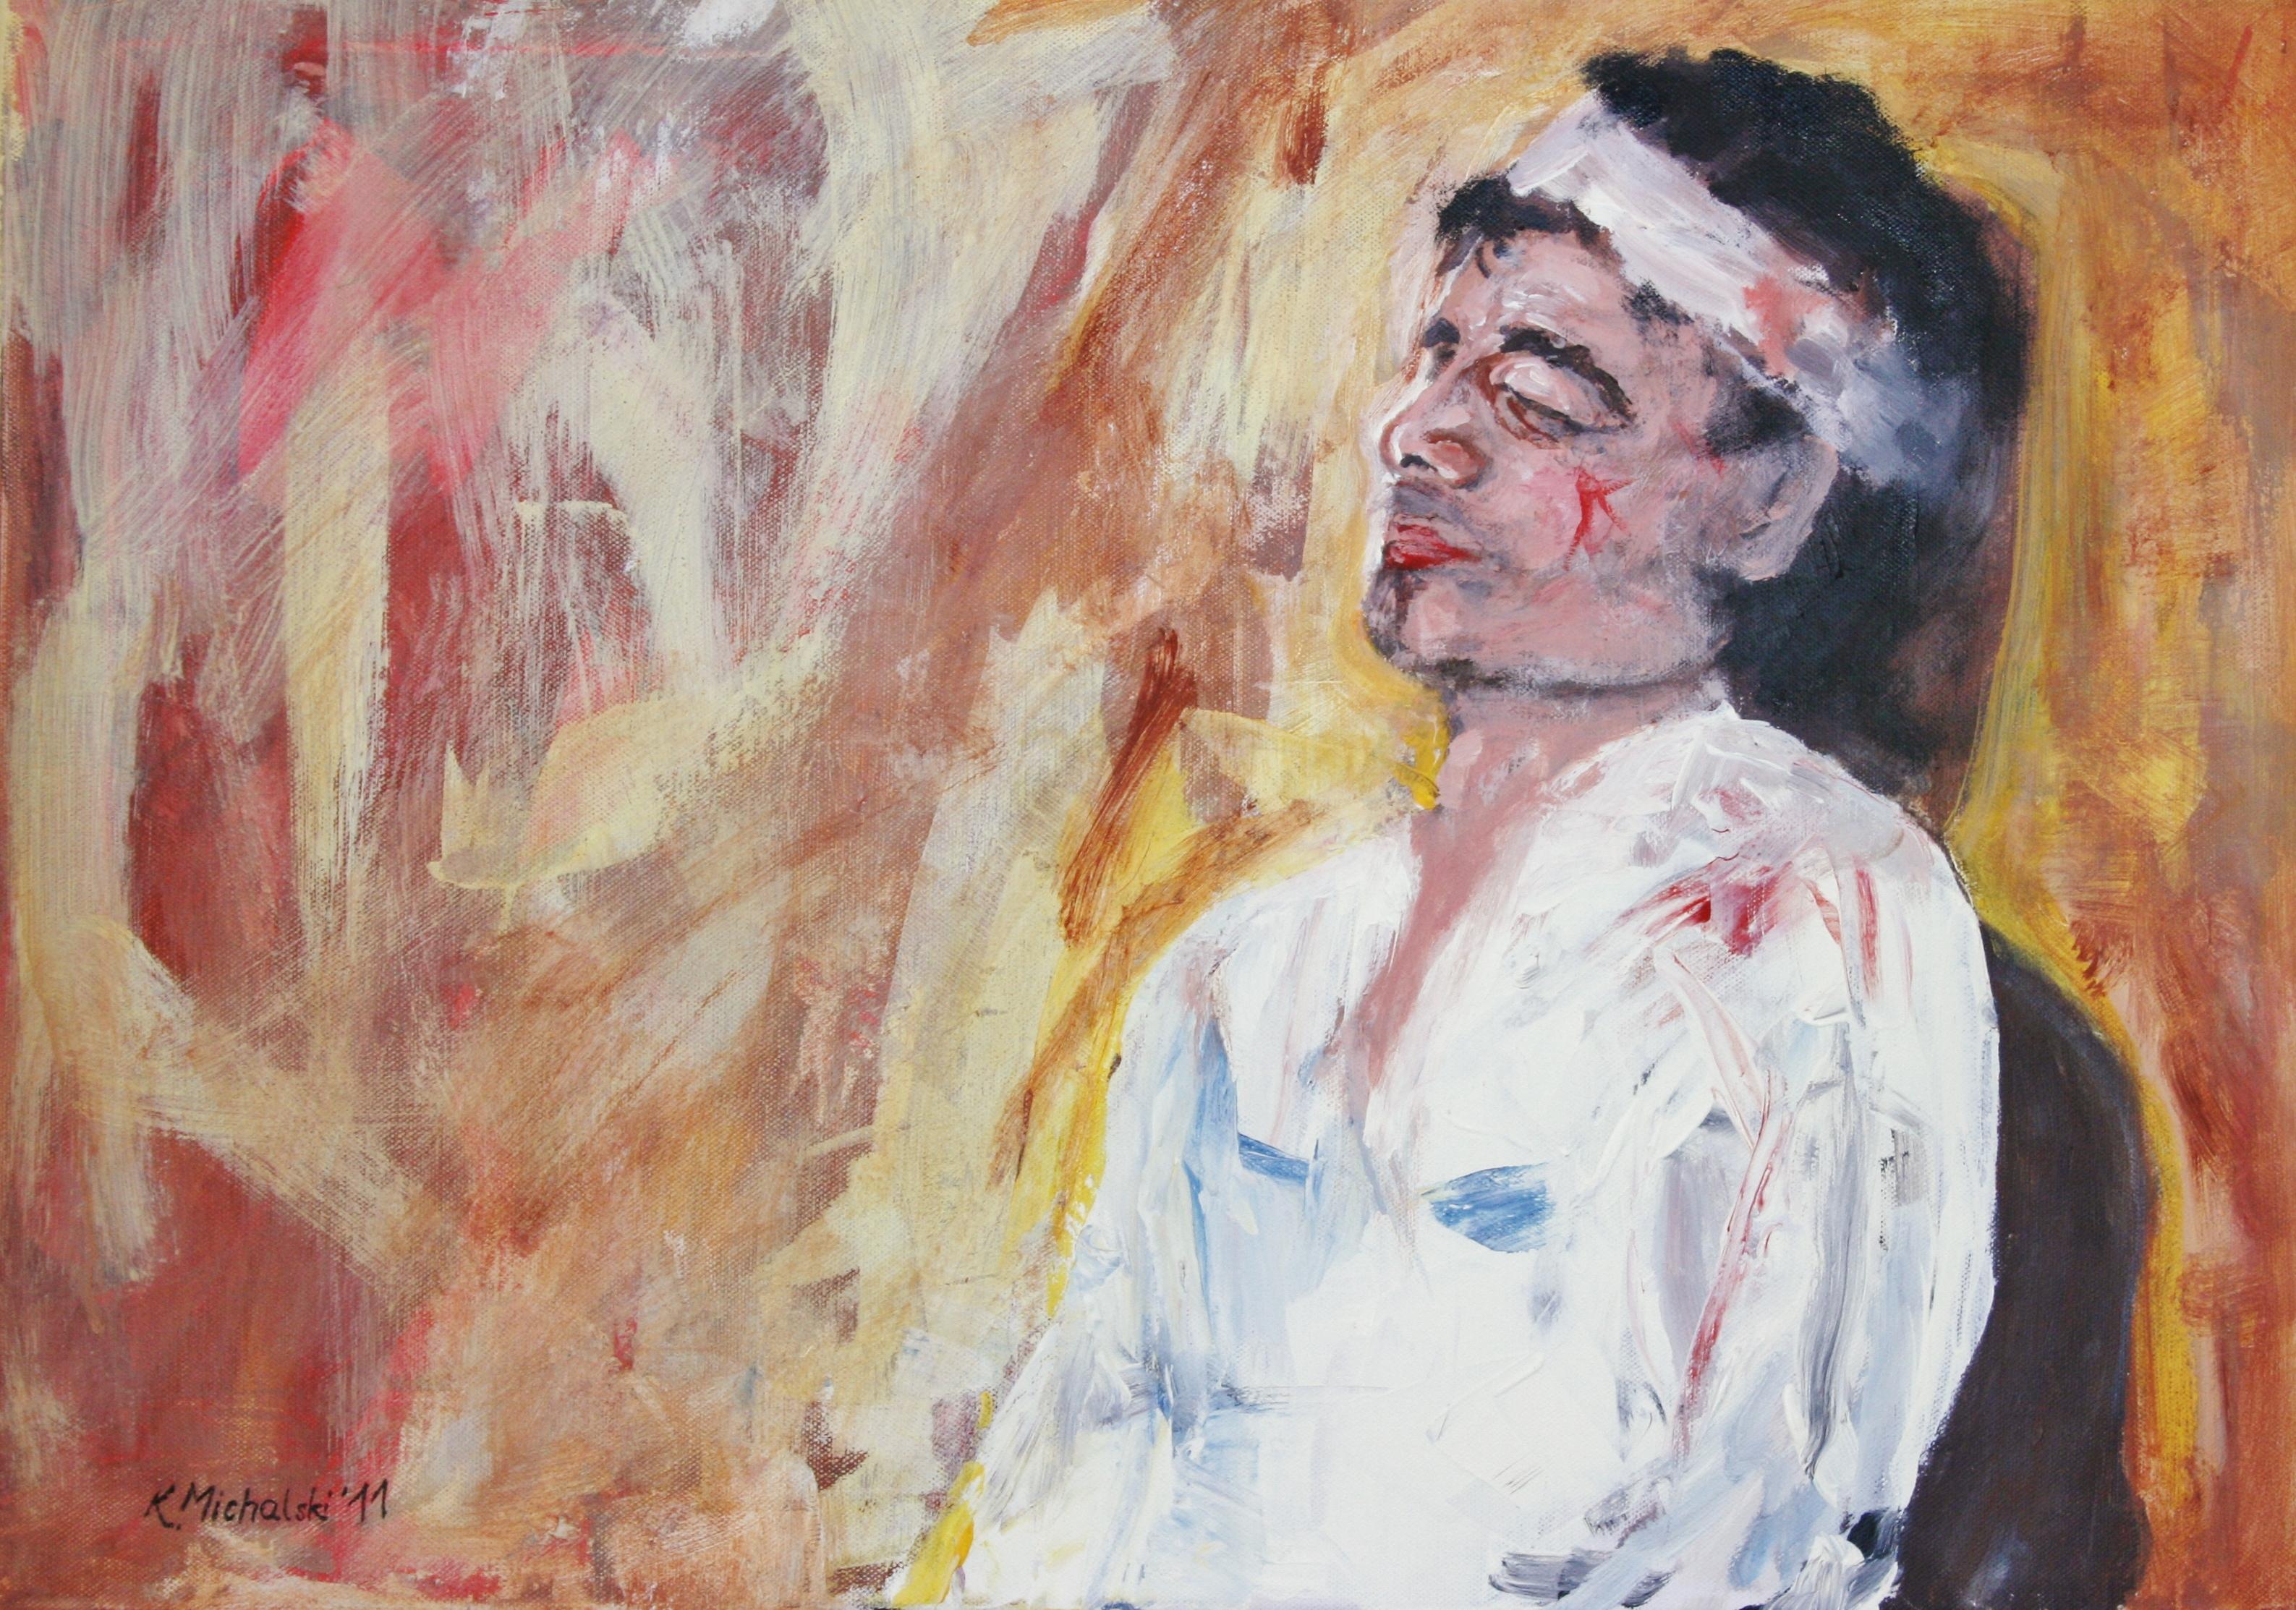 José, 2011, 50 x 70, Acryl auf Leinwand